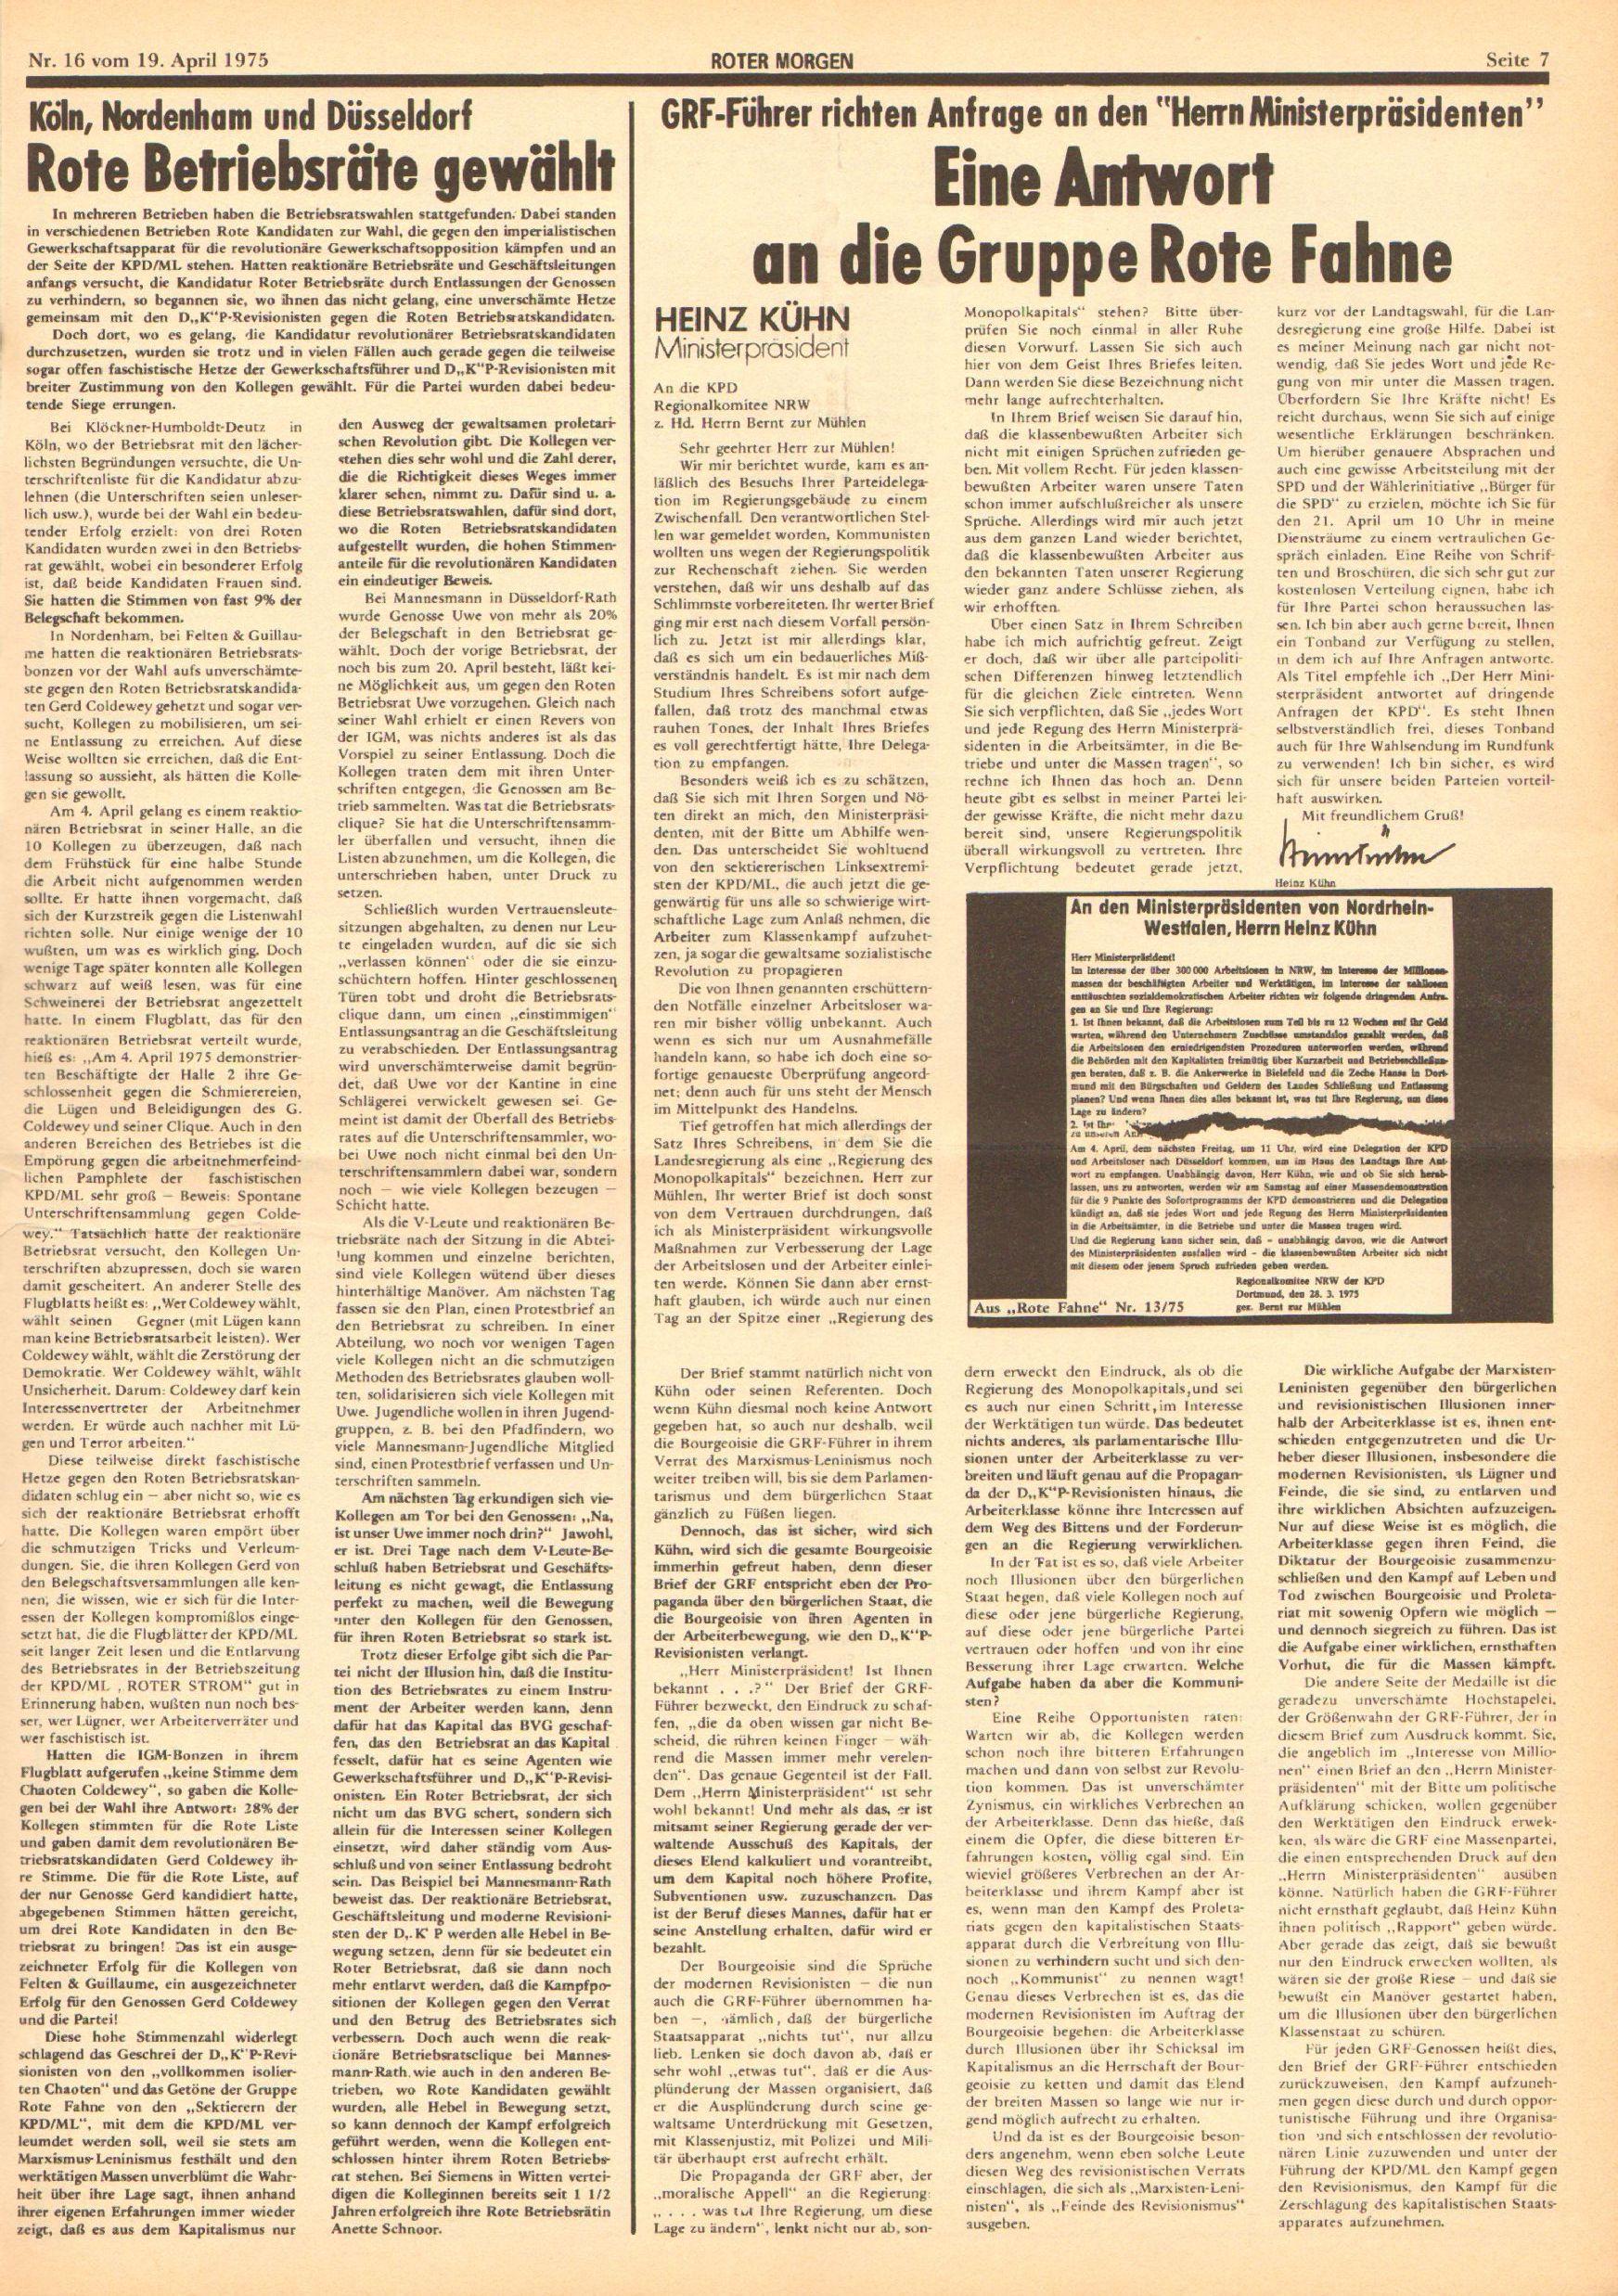 Roter Morgen, 9. Jg., 19. April 1975, Nr. 16, Seite 7